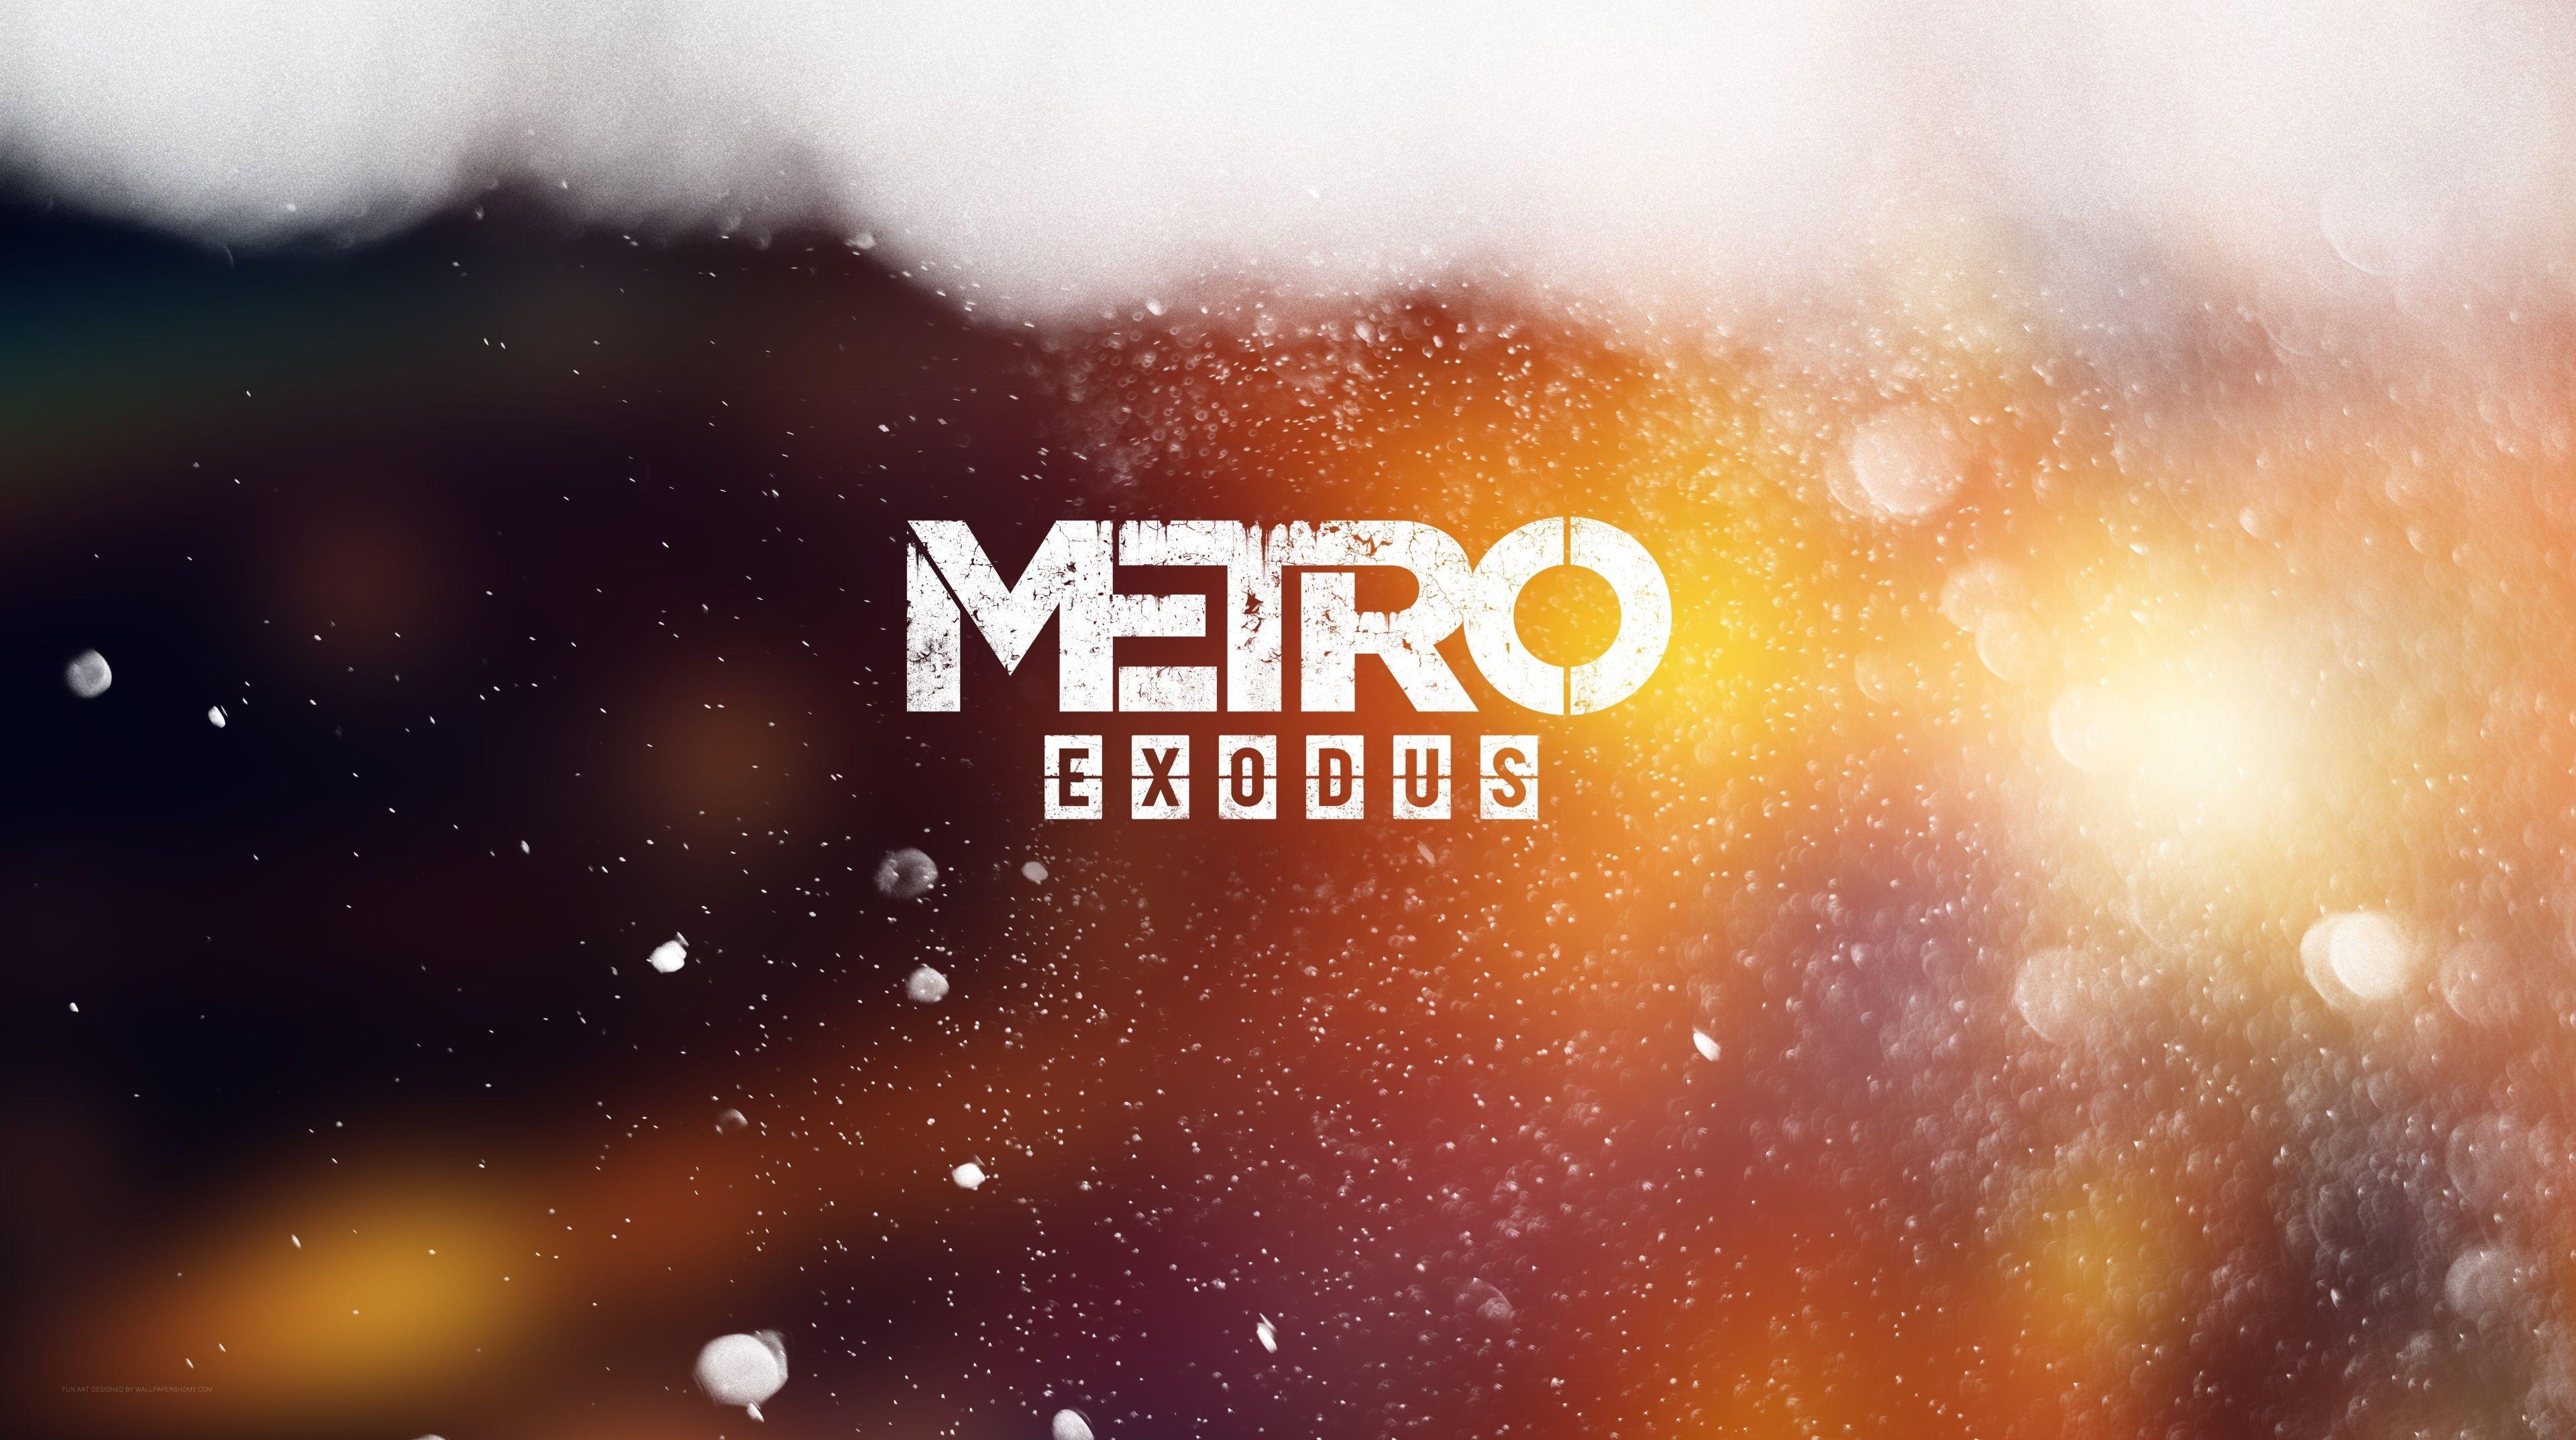 3840x2146 metro exodus 4k high resolution wallpaper for ...